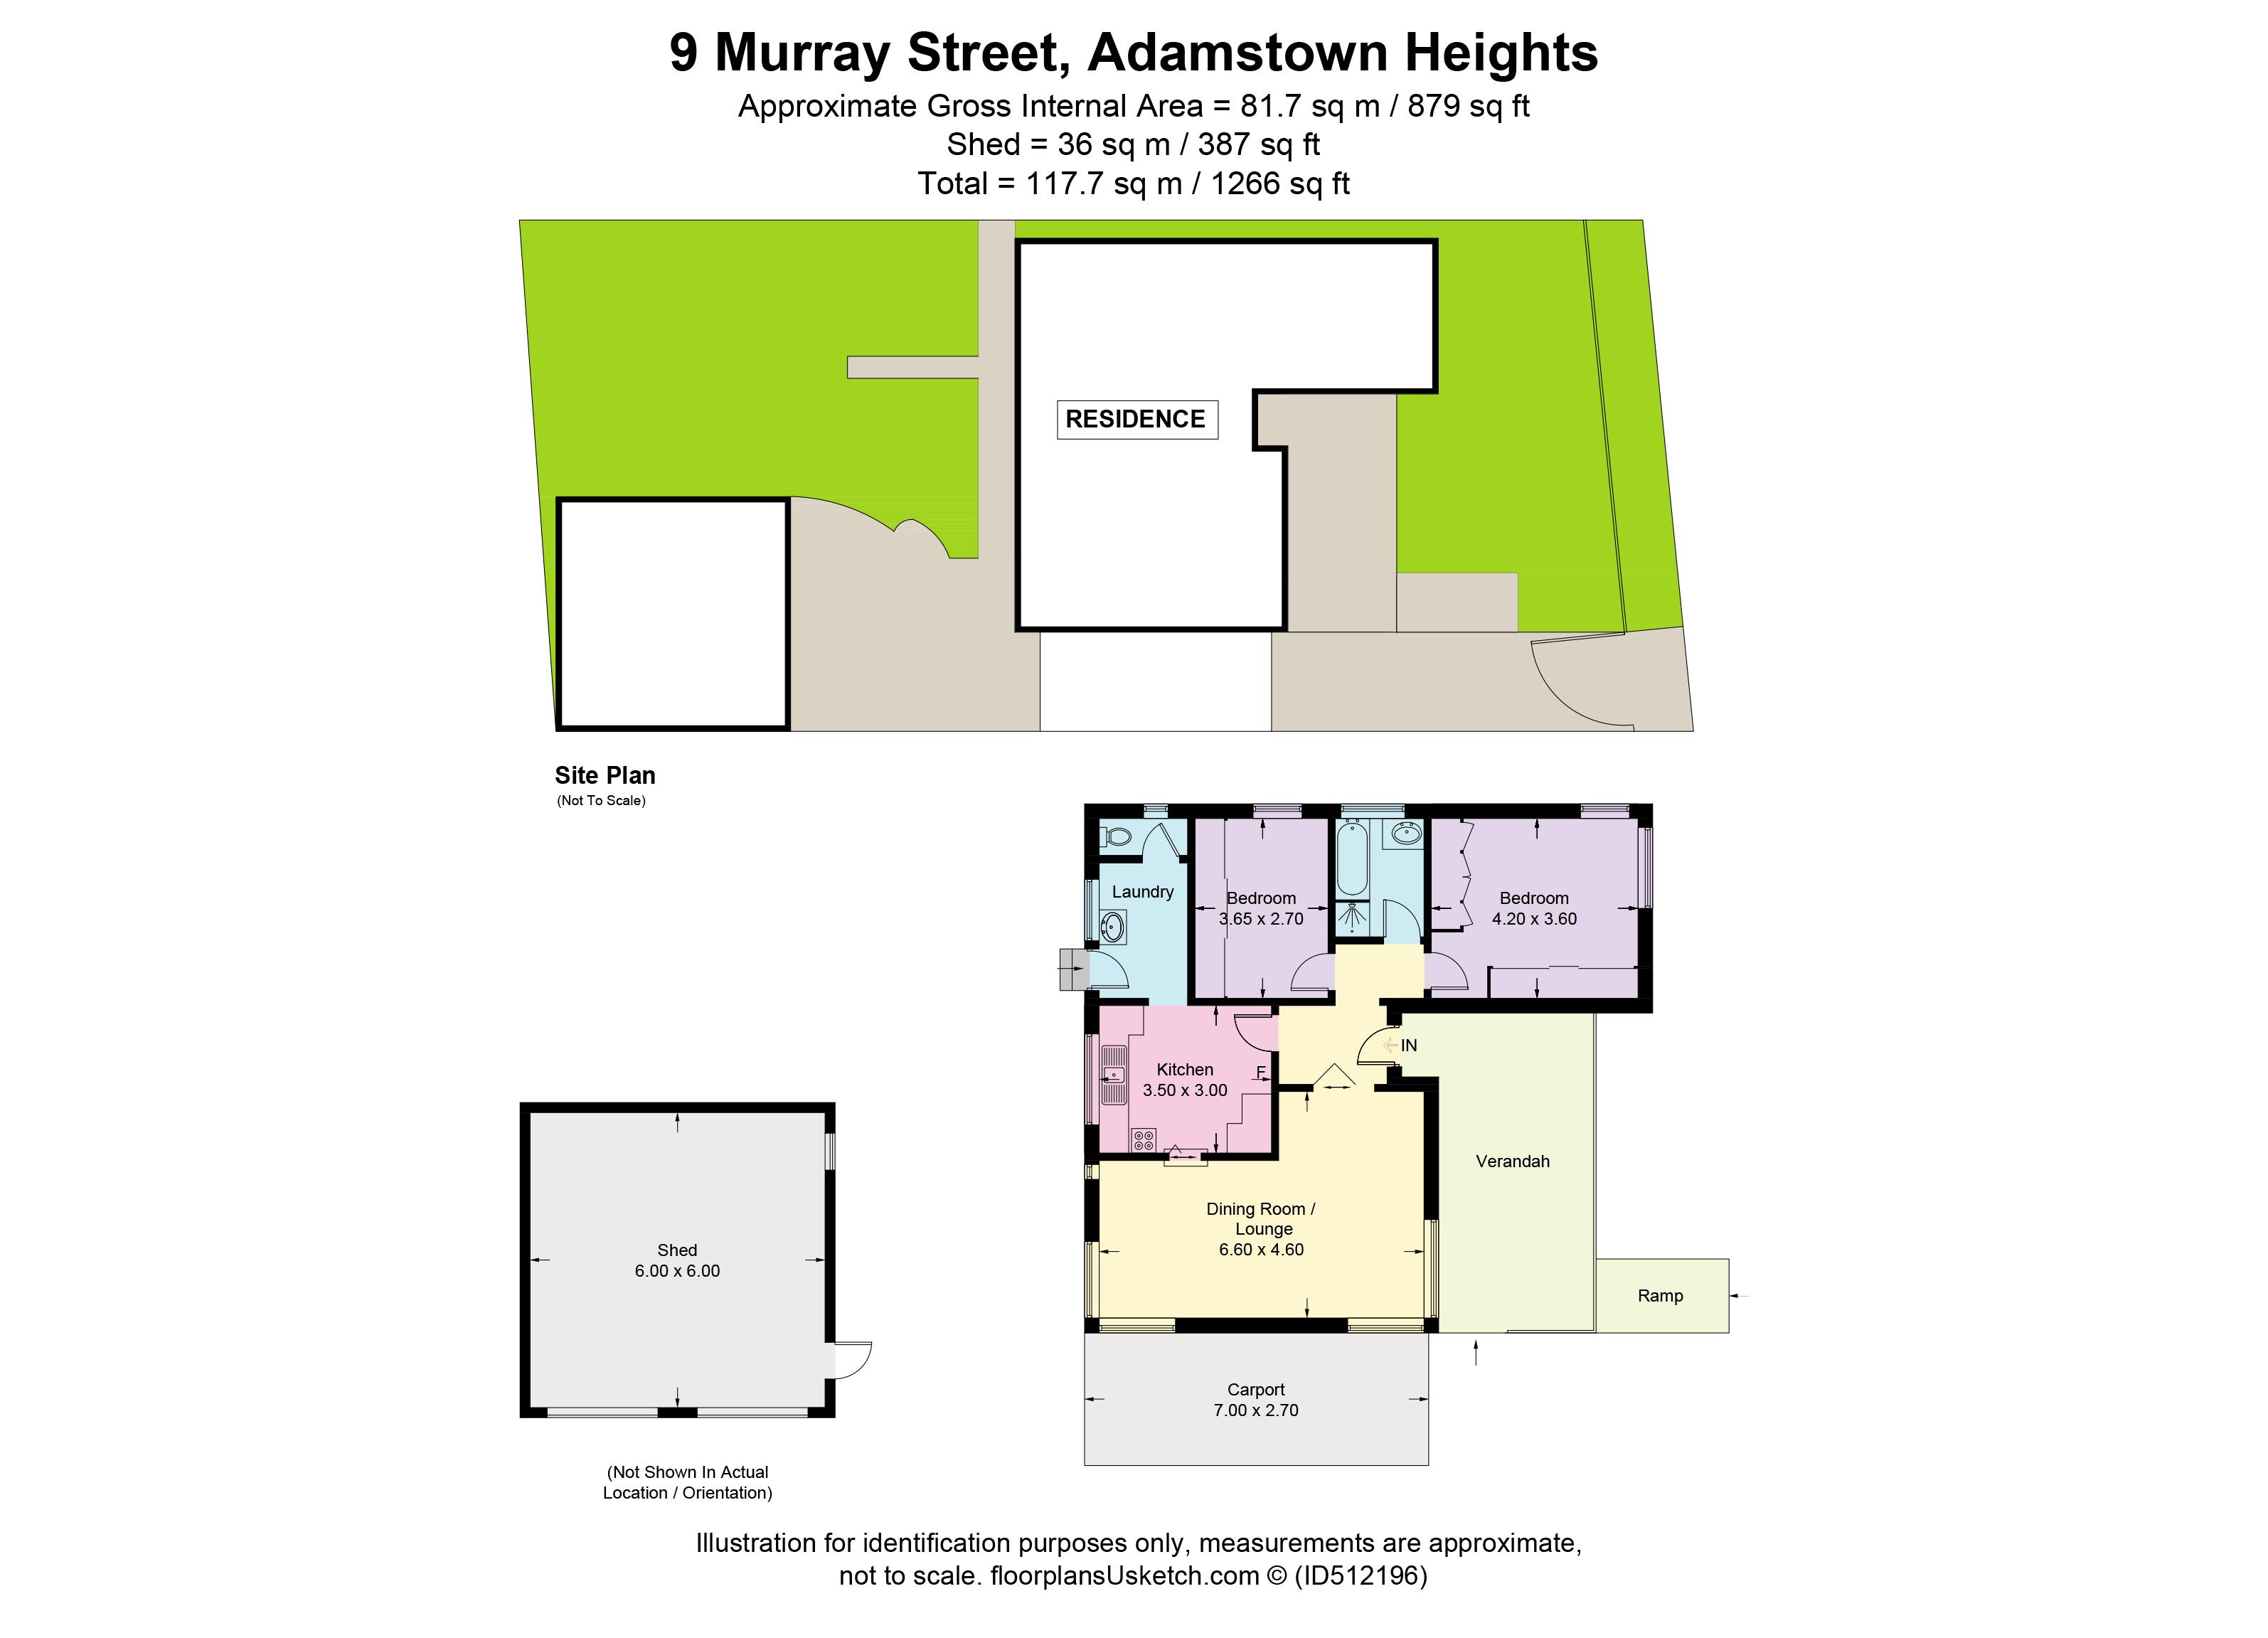 9 Murray Street, Adamstown Heights, NSW 2289